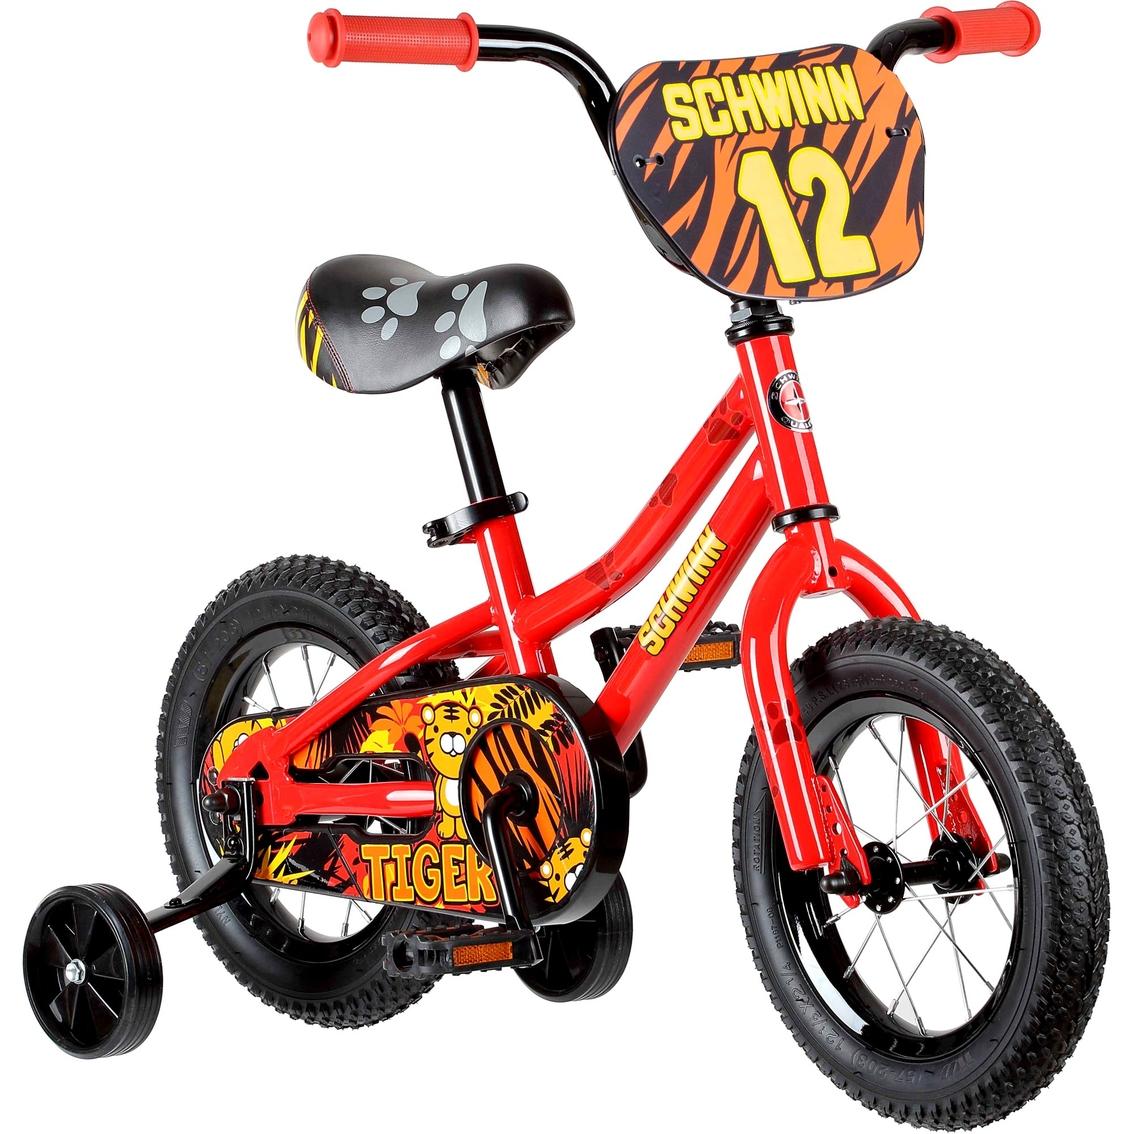 Schwinn Boys Tiger 12 In. Bike - Kids' Bikes - Sports & Outdoors - Shop The Exchange - 웹